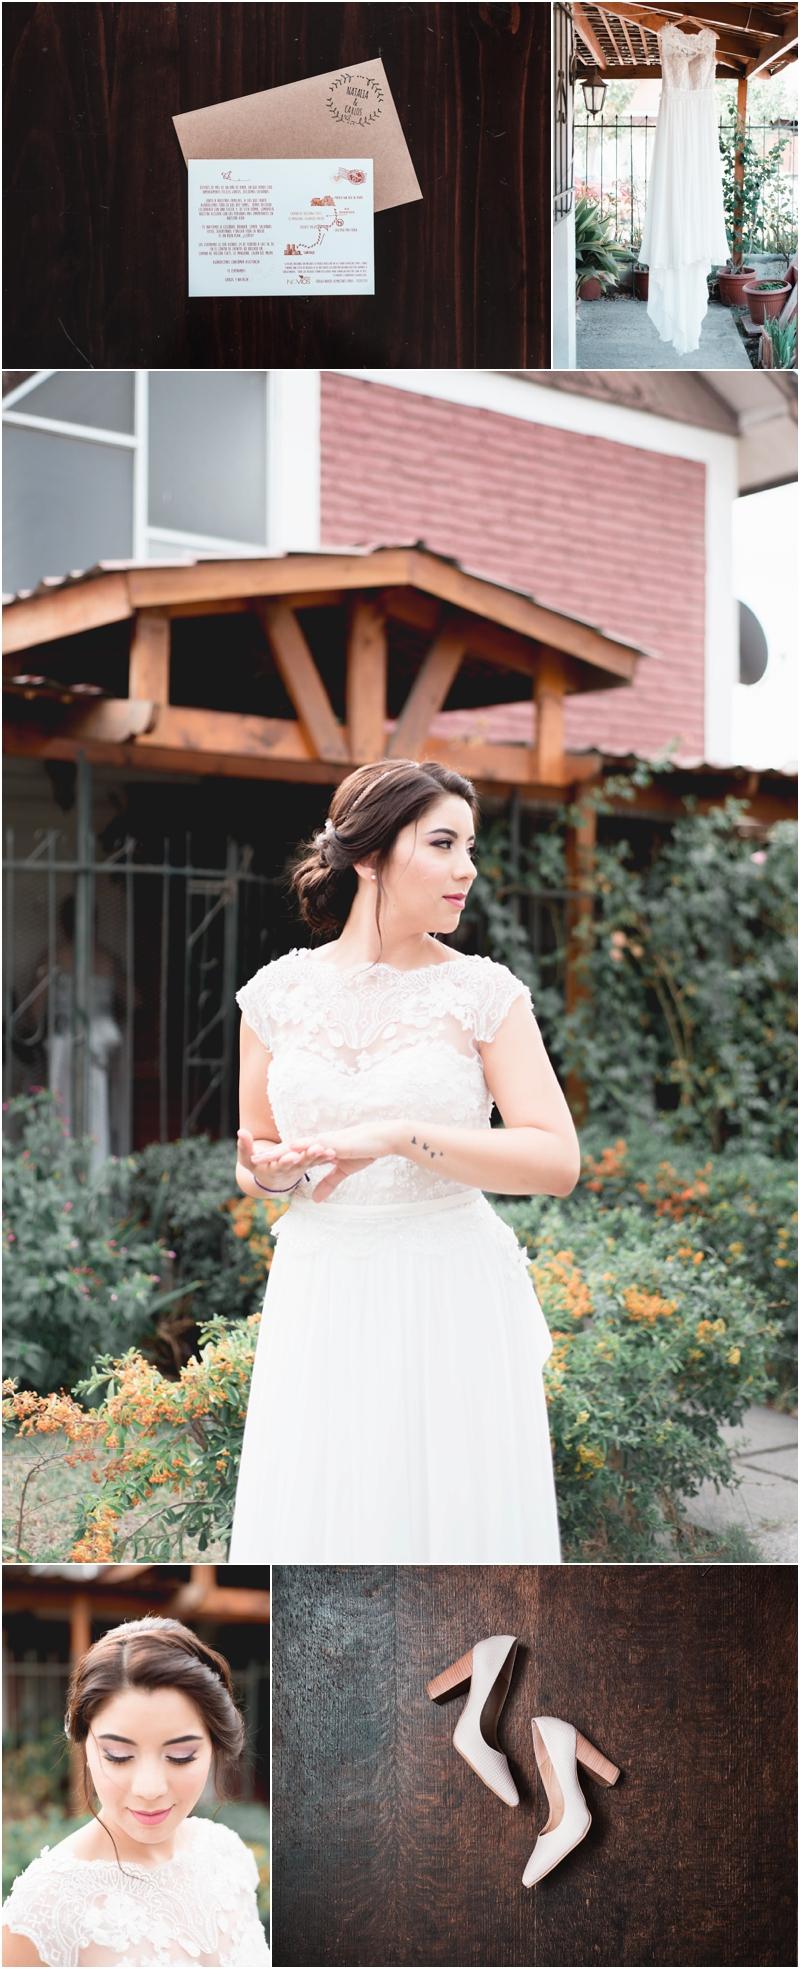 Fotografía de Matrimonios, Ampersand Wedding Films